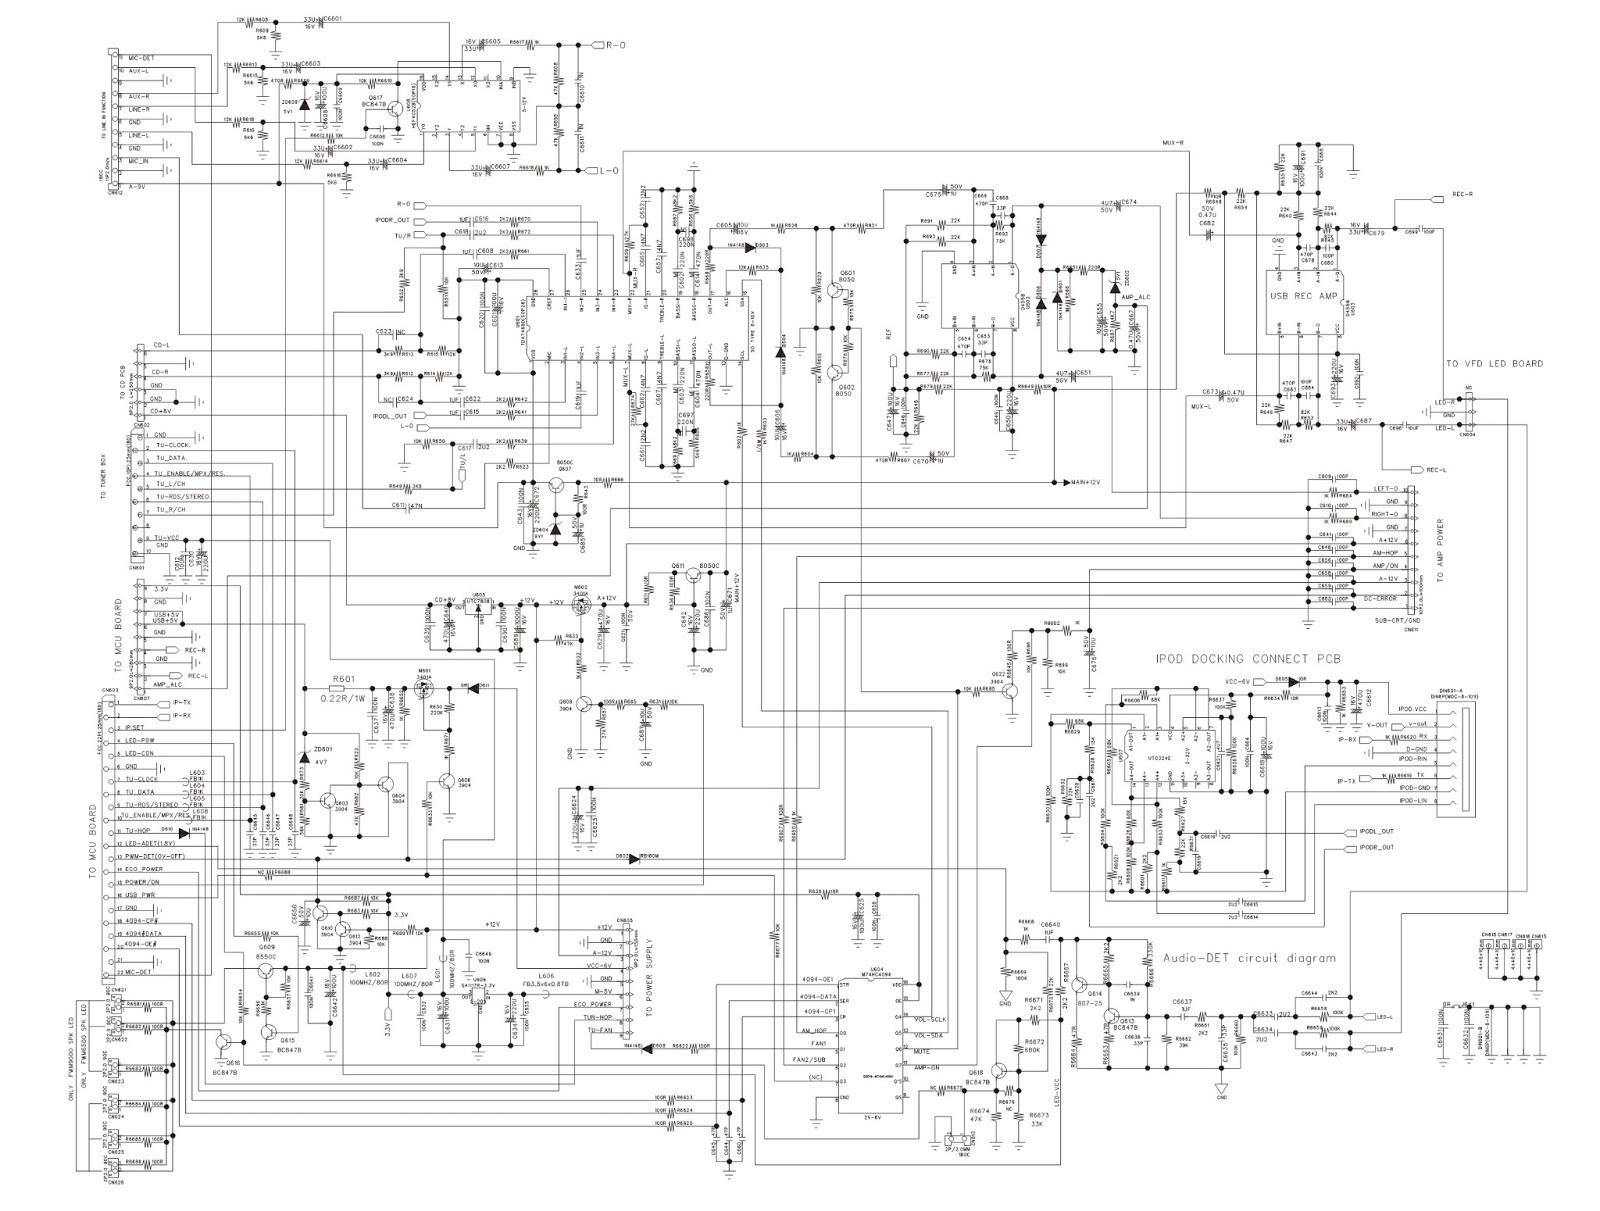 PHILIPS FWM6500  SCHEMATIC DIAGRAMS  Printed Circuit